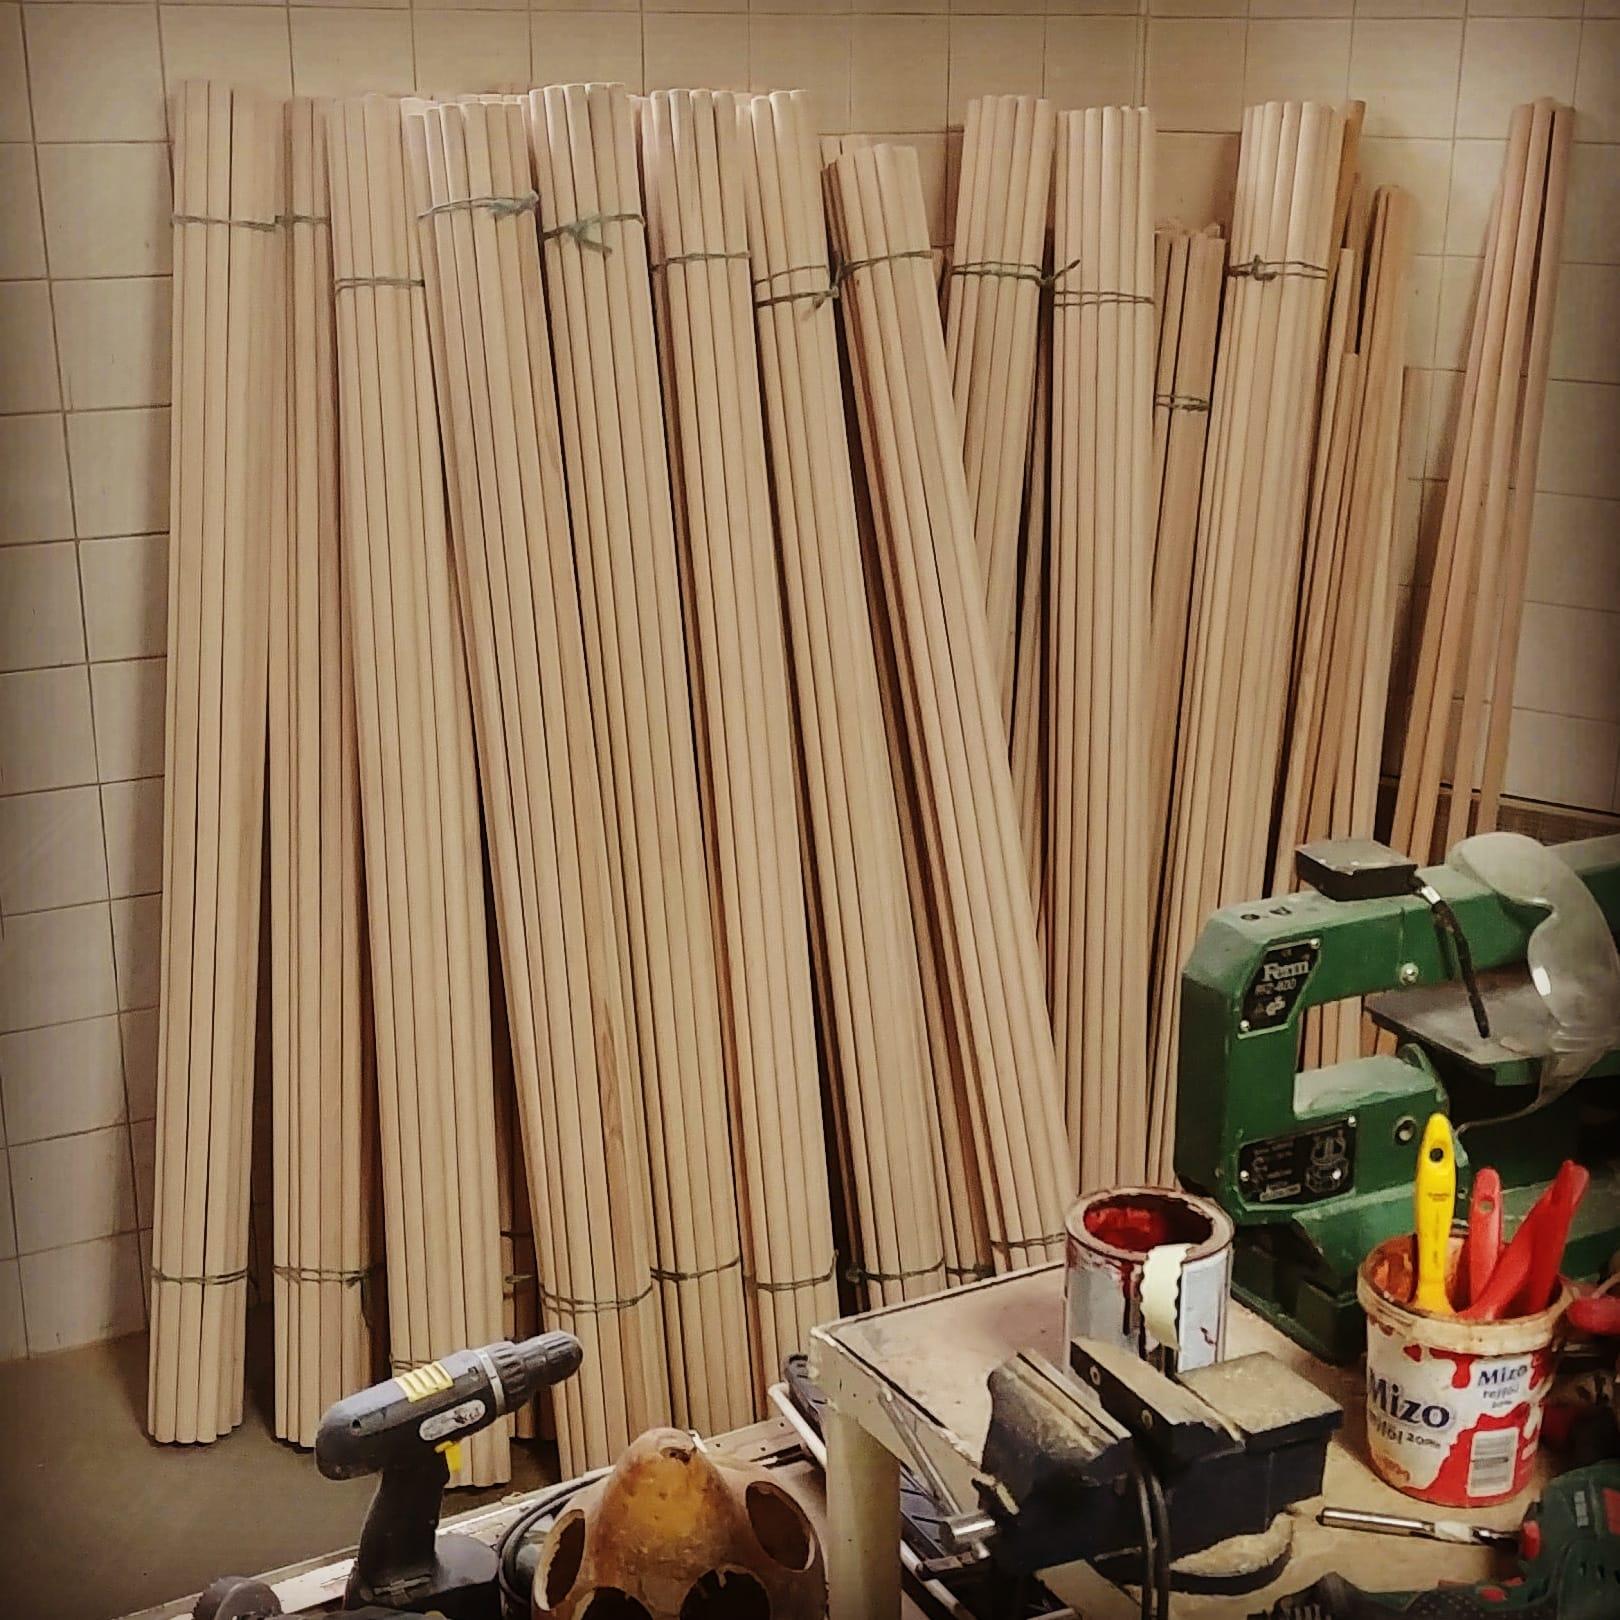 raw material verga replacement for berimbau instrument capoeira berimbau shop